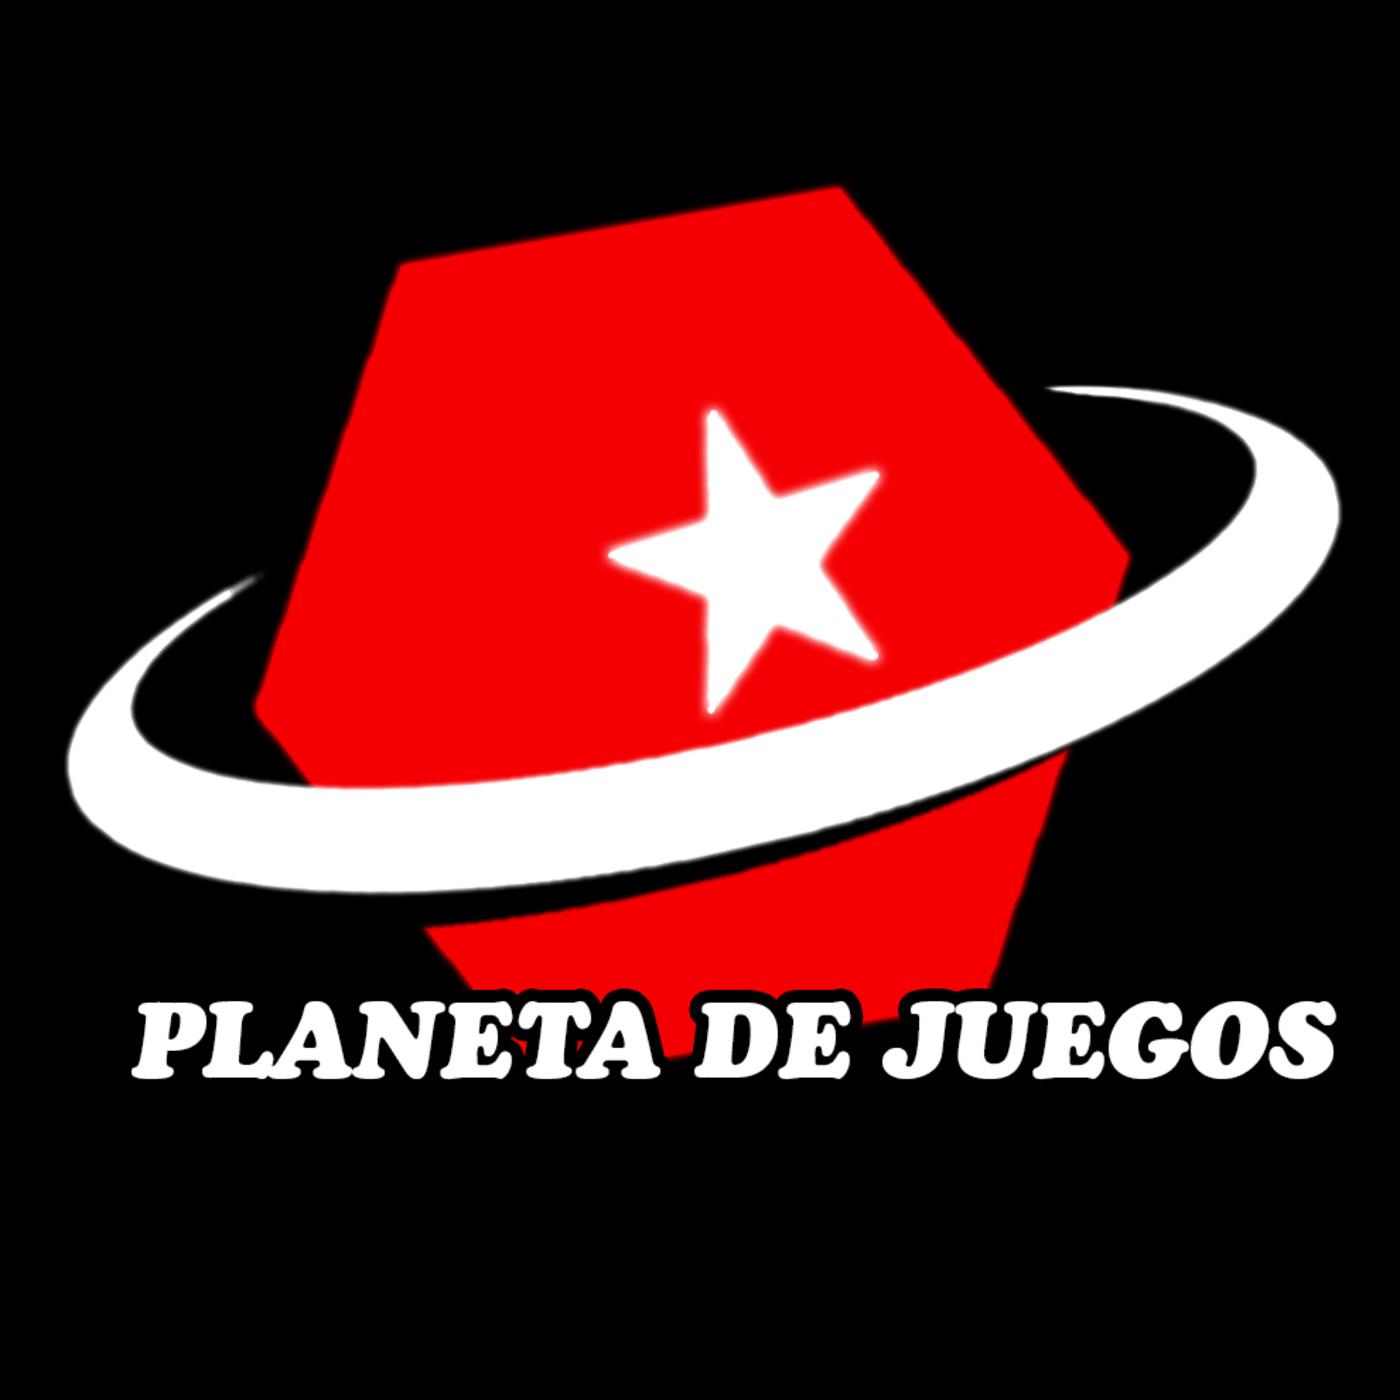 Planeta de Juegos 40 - Especial solitarios con Clint Burton